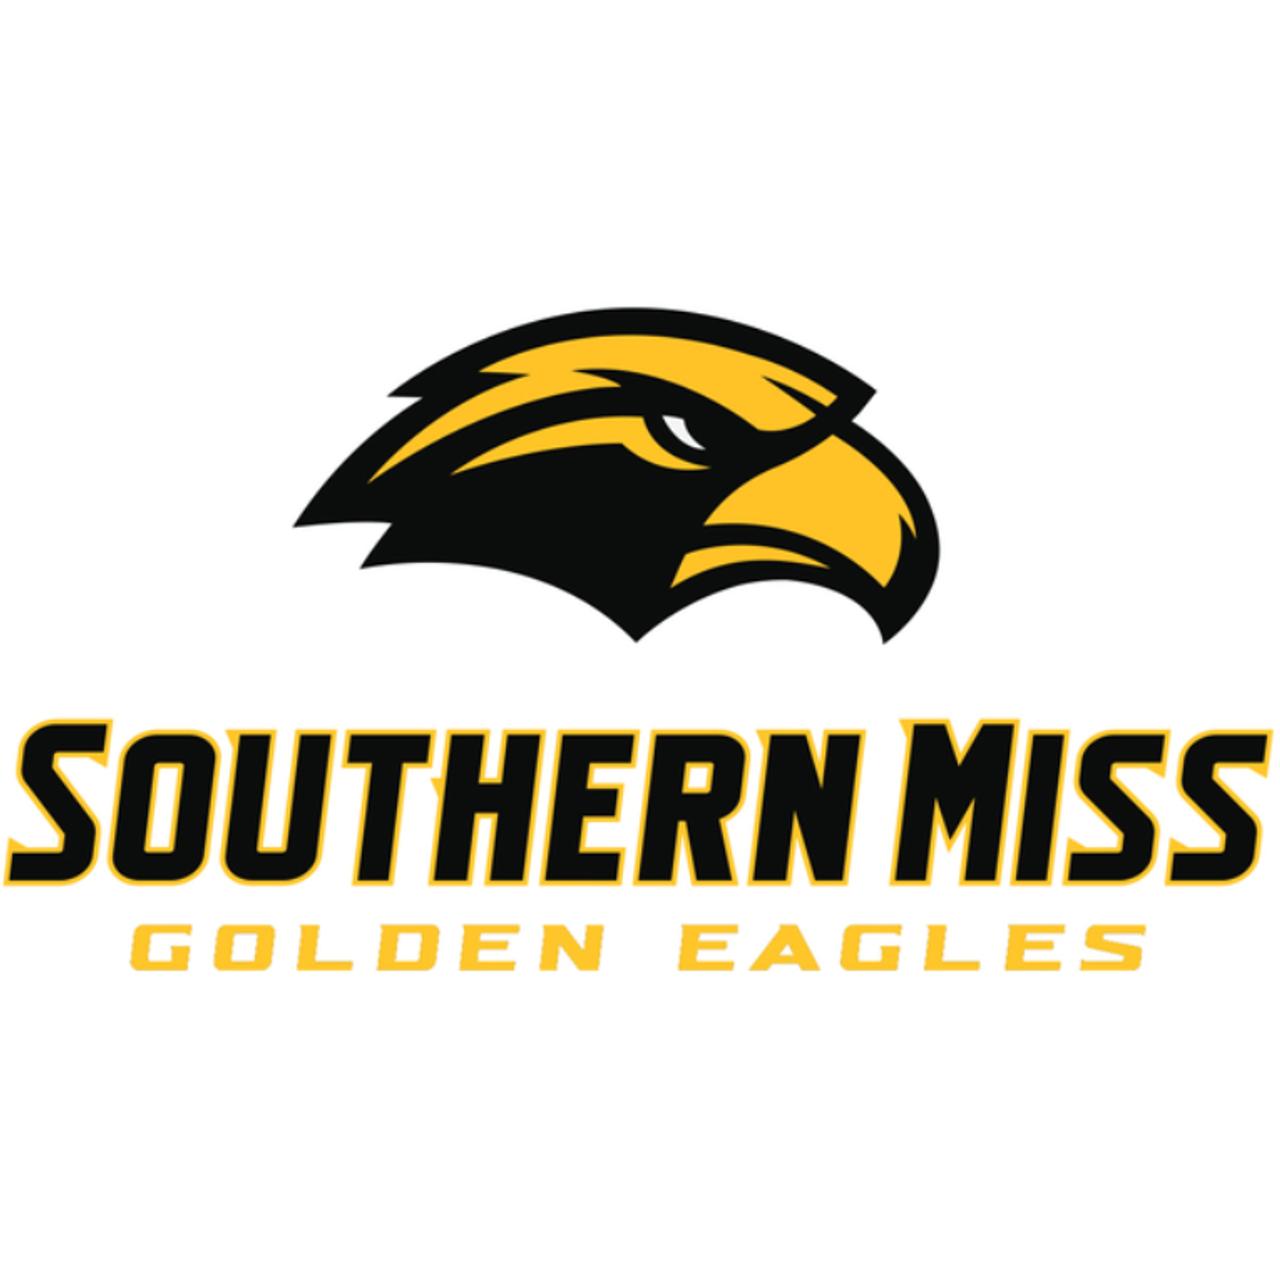 University of Southern Mississippi Golden Eagles